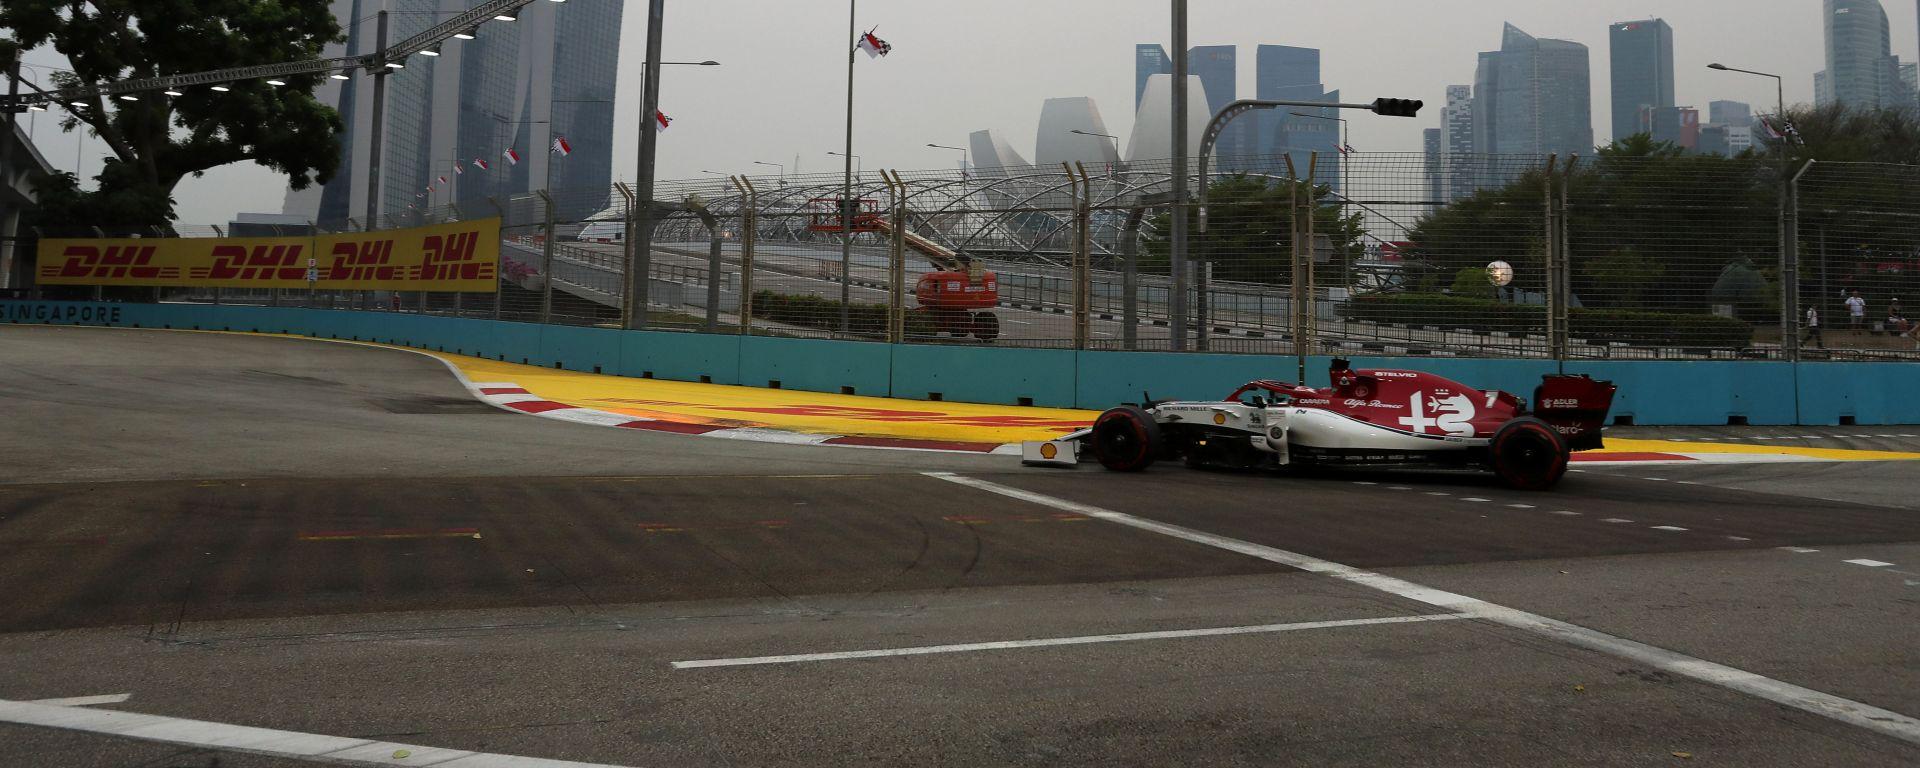 F1 GP Singapore 2019, Marina Bay: Kimi Raikkonen (Alfa Romeo Racing)